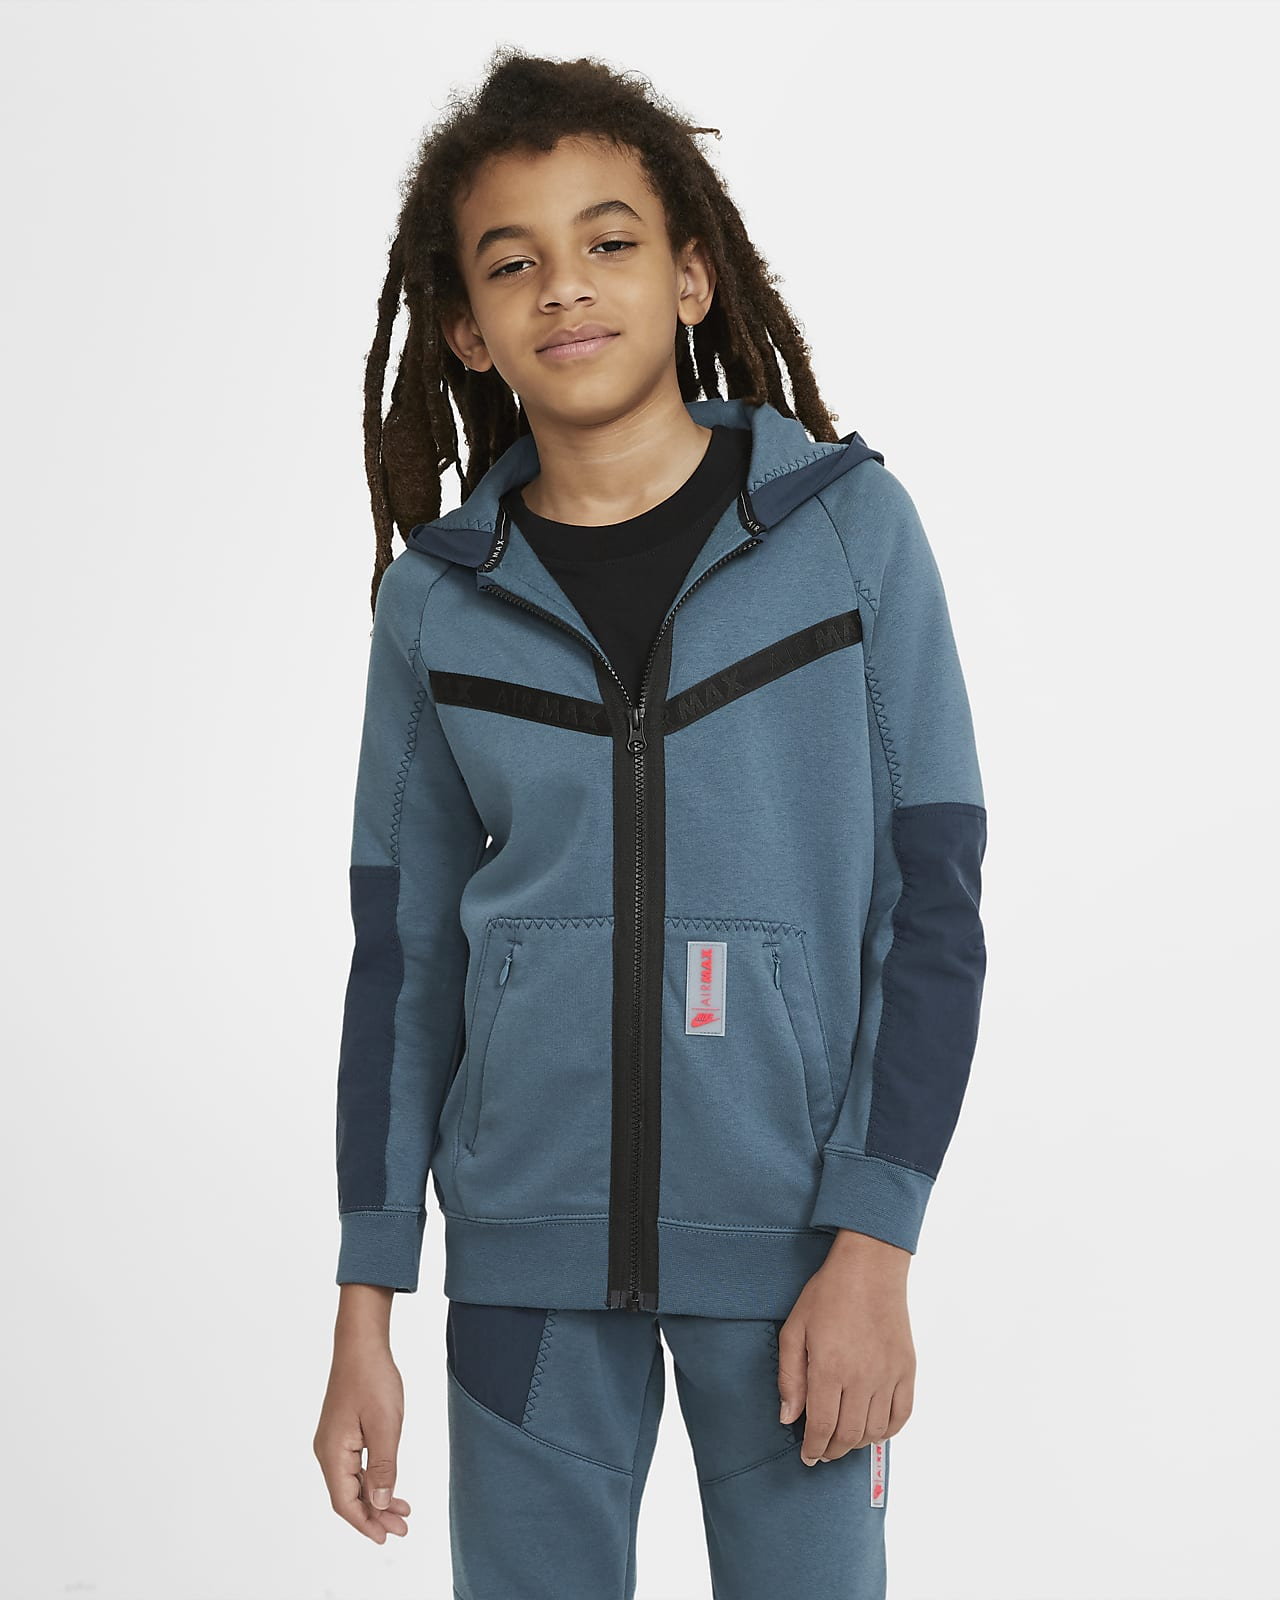 Hoodie de lã cardada com fecho completo Nike Sportswear Air Max Júnior (Rapaz)